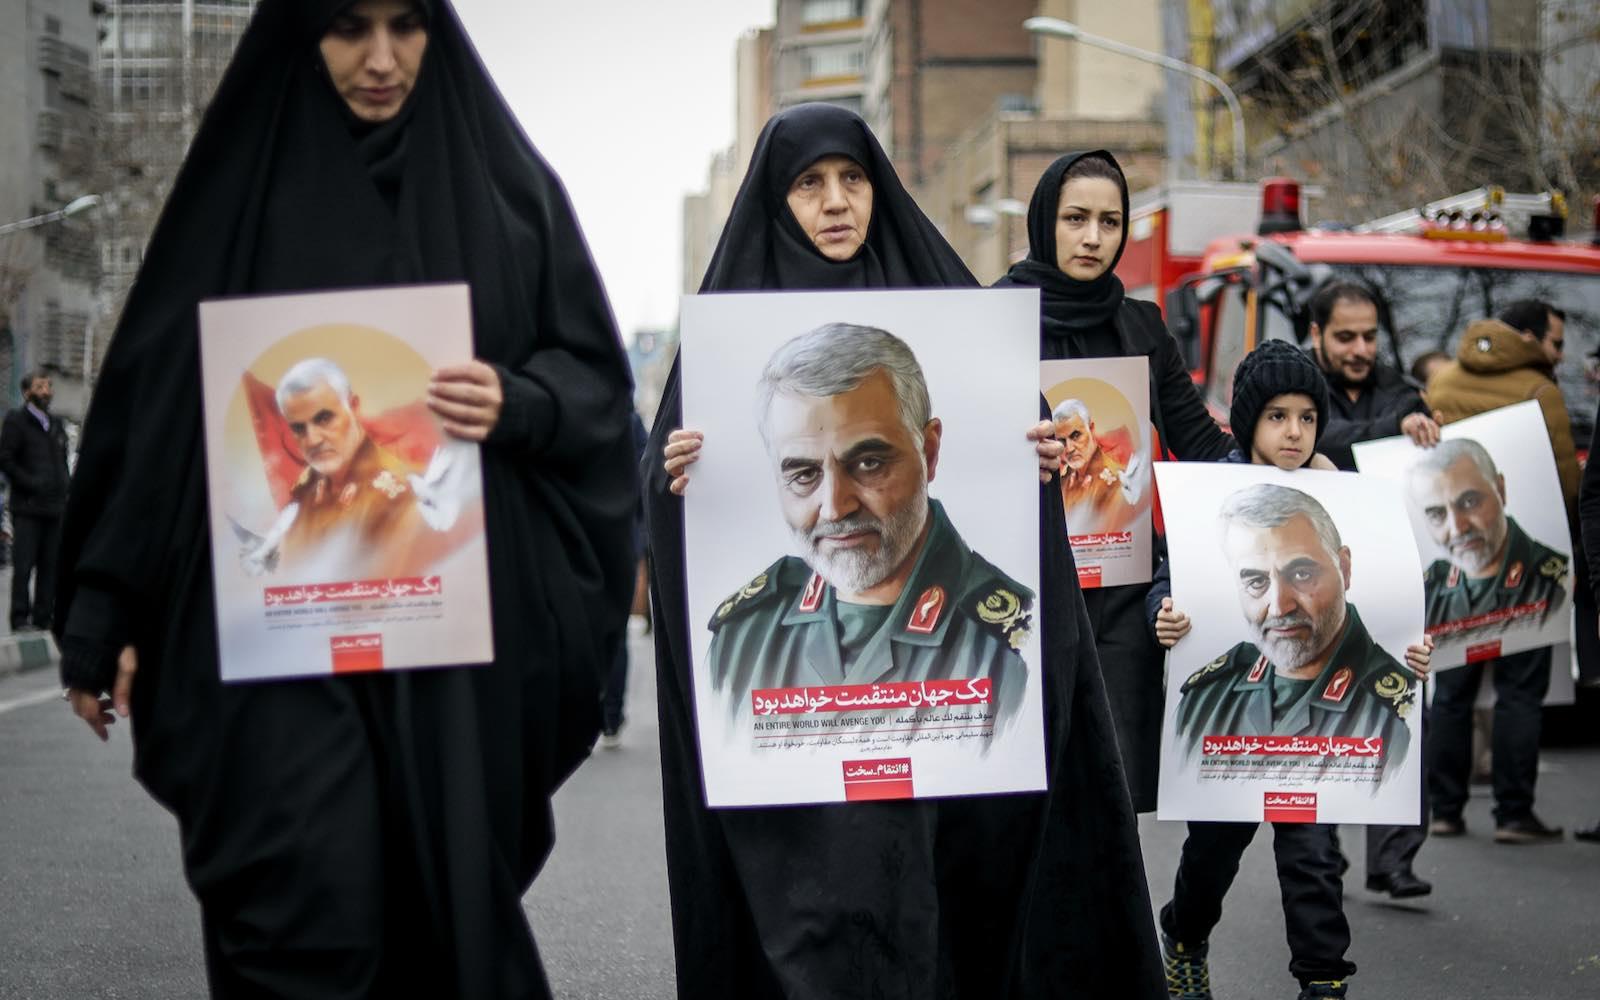 Iranians protest the US strike that killed Commander Qasem Soleimani and nine others, Tehran, 4 January 2020 (Hamid Vakili/NurPhoto via Getty Images)